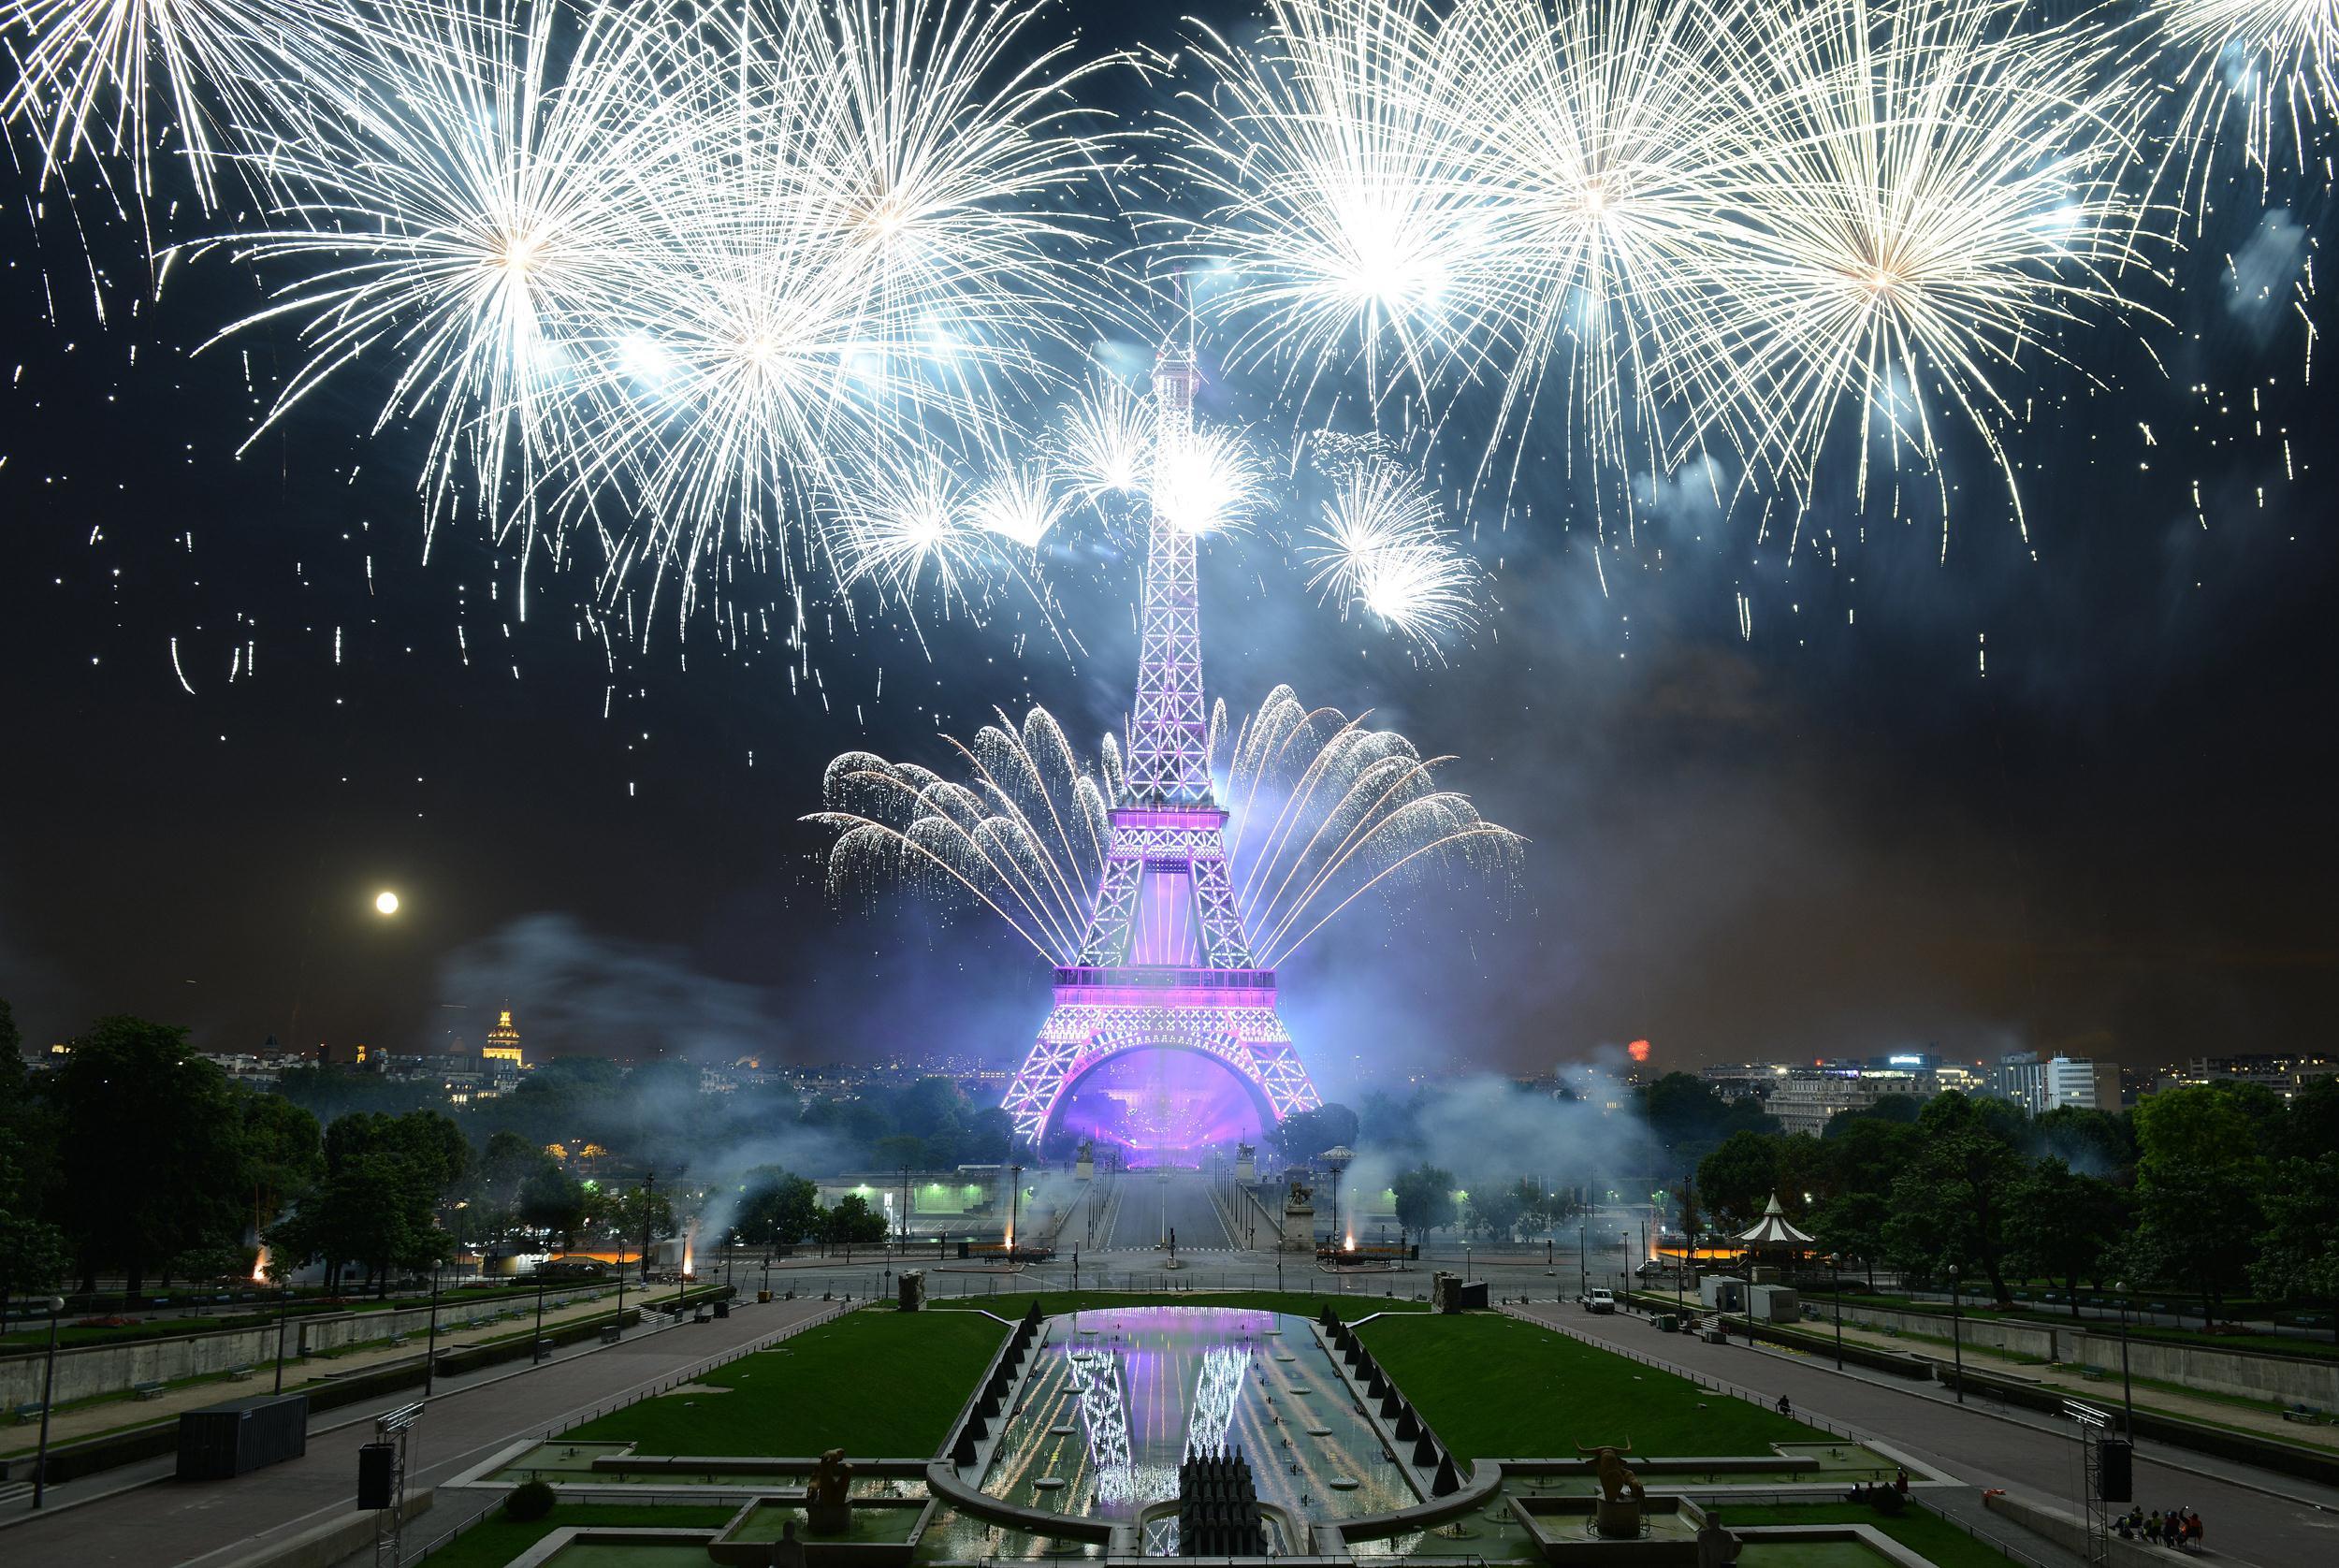 Image: Bastille Day Fireworks At Eiffel Tower